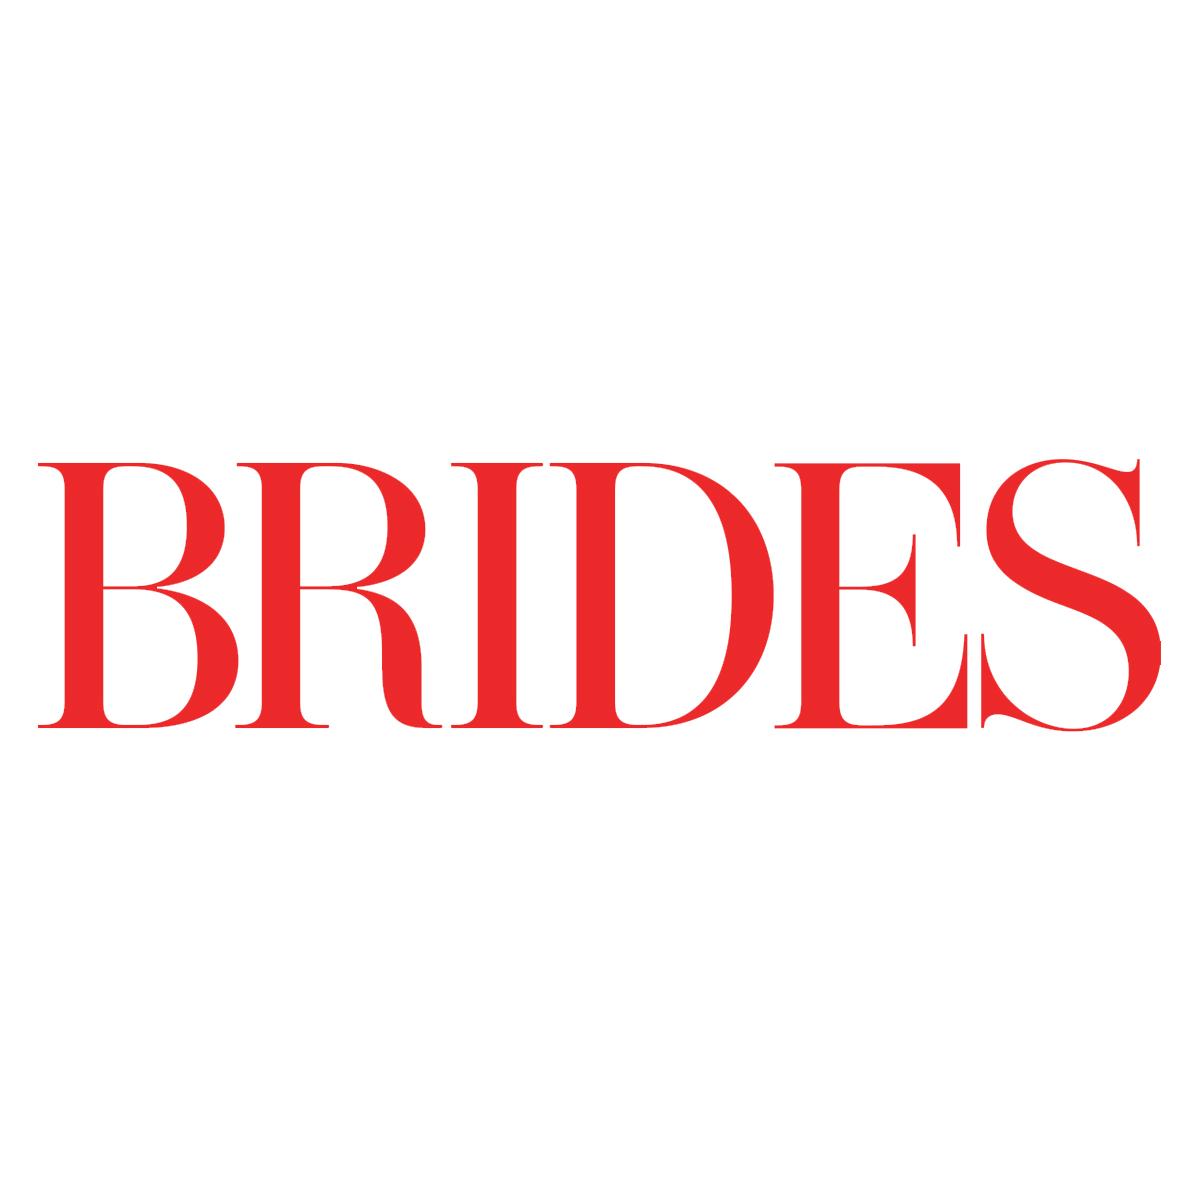 Brides.jpg